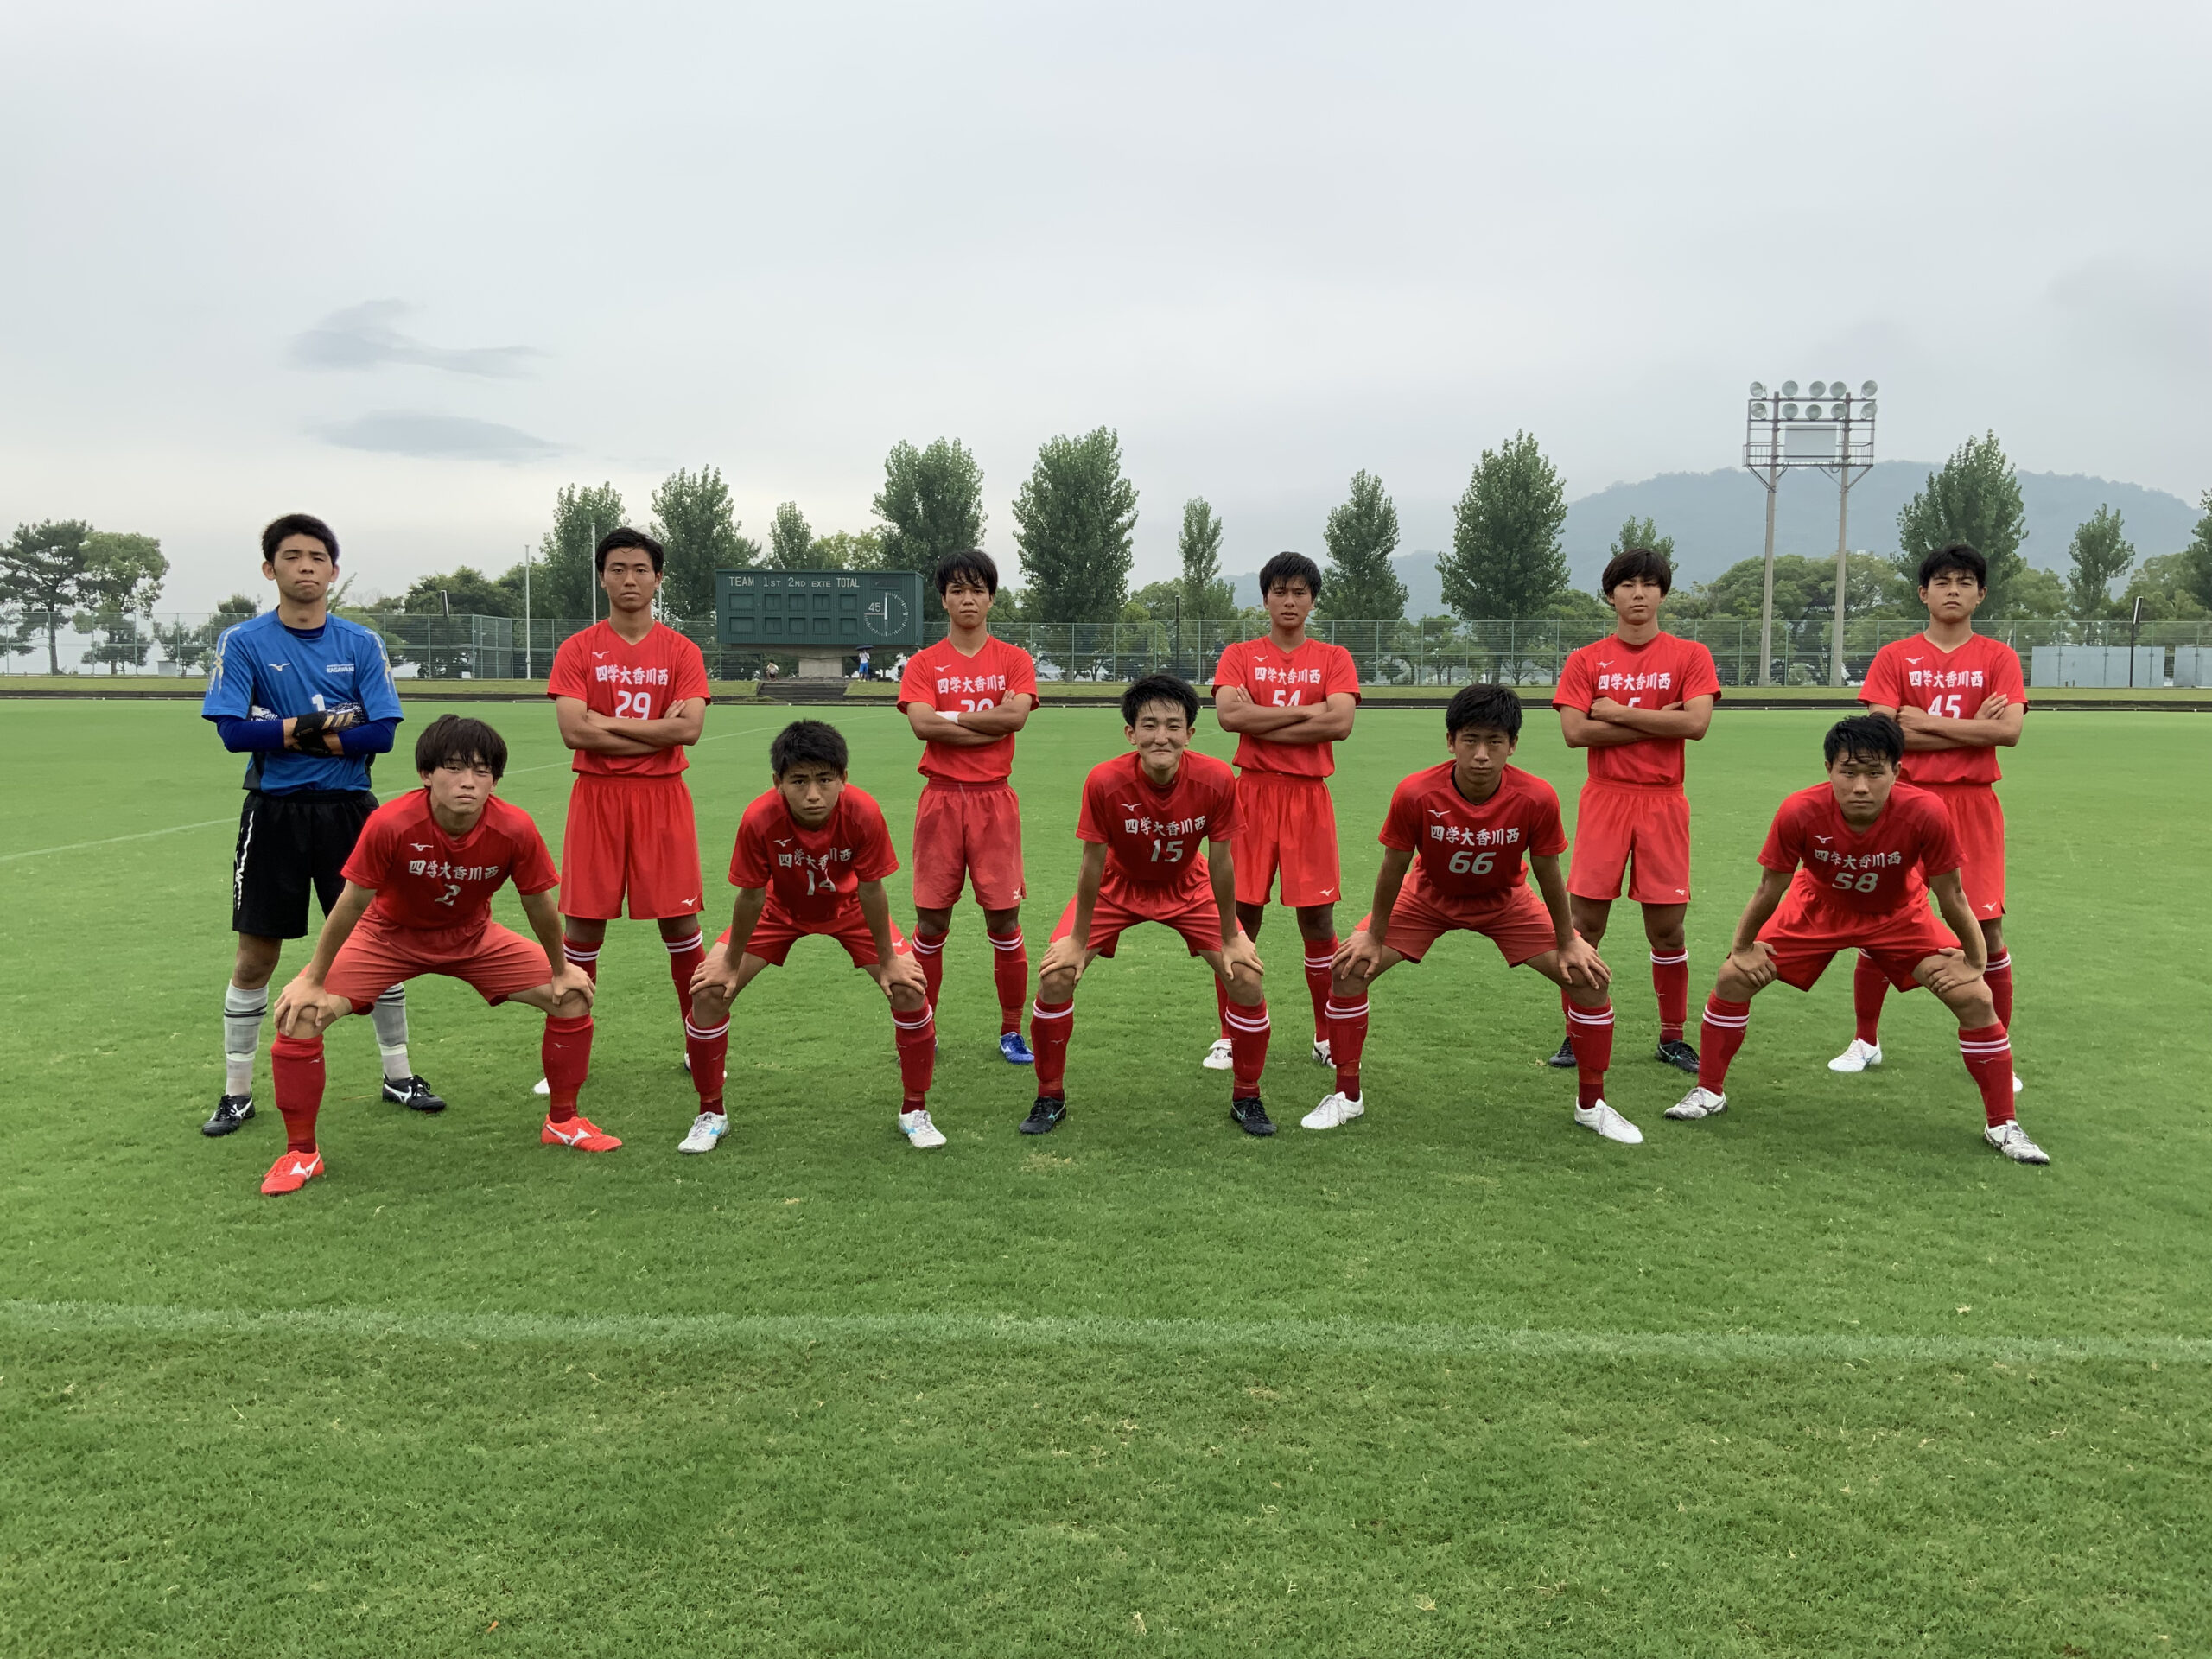 香川県2種リーグ1部 VS高松商業